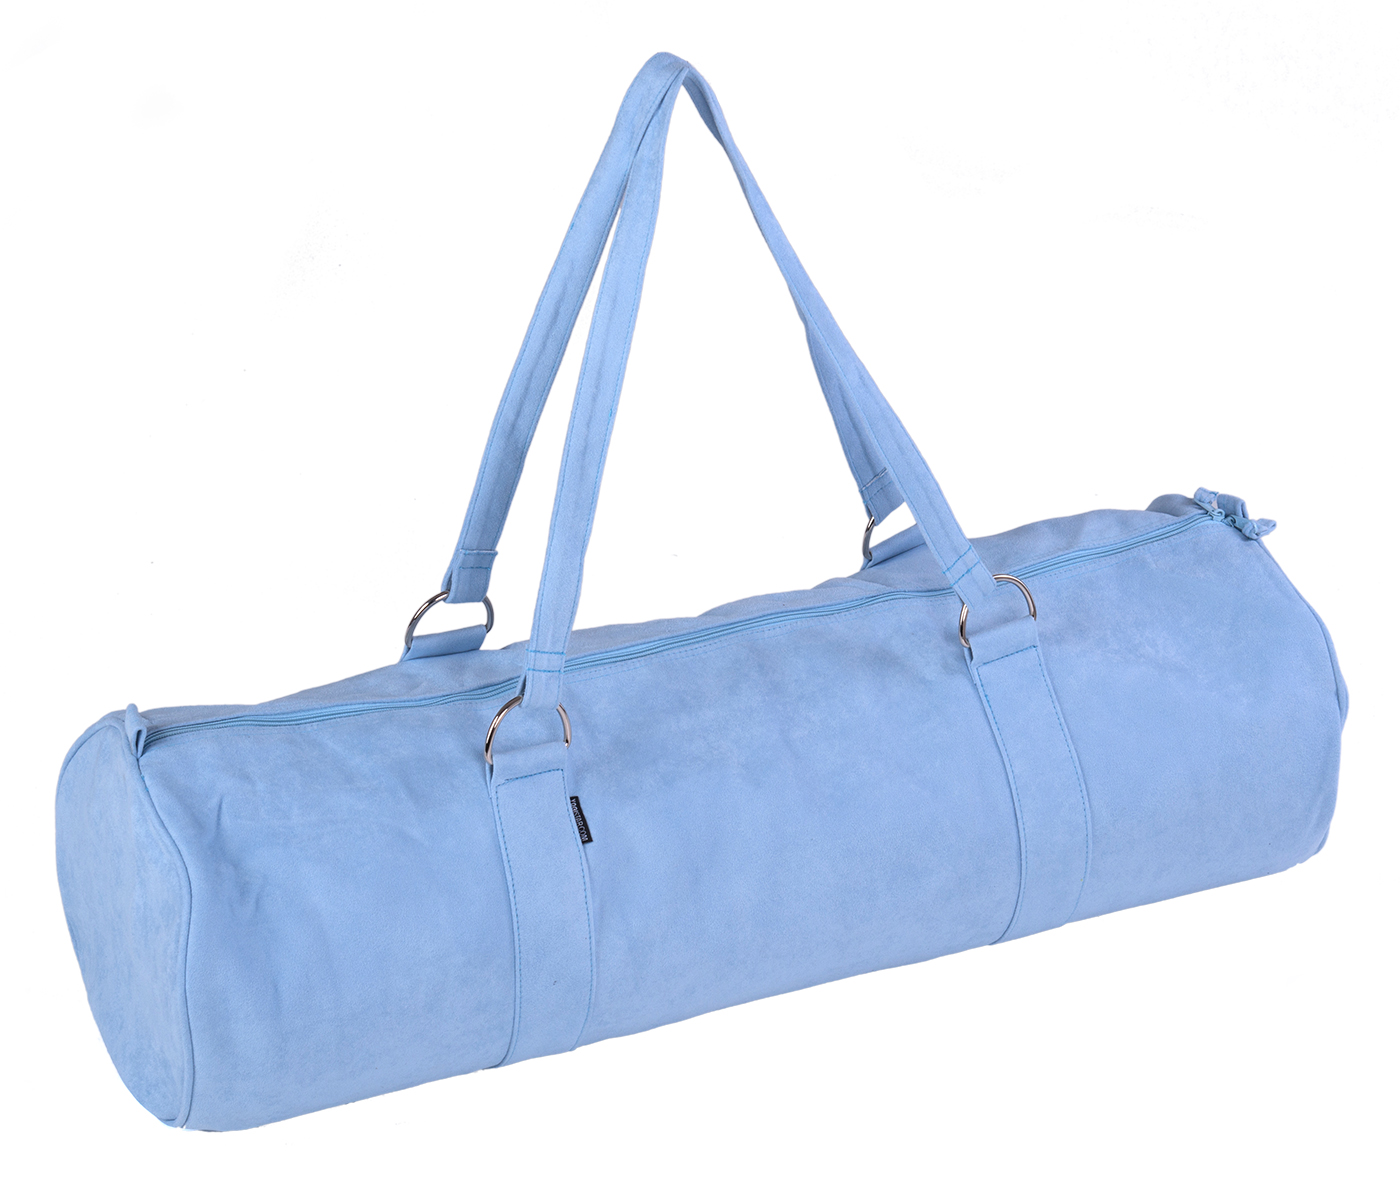 Citybag extra big